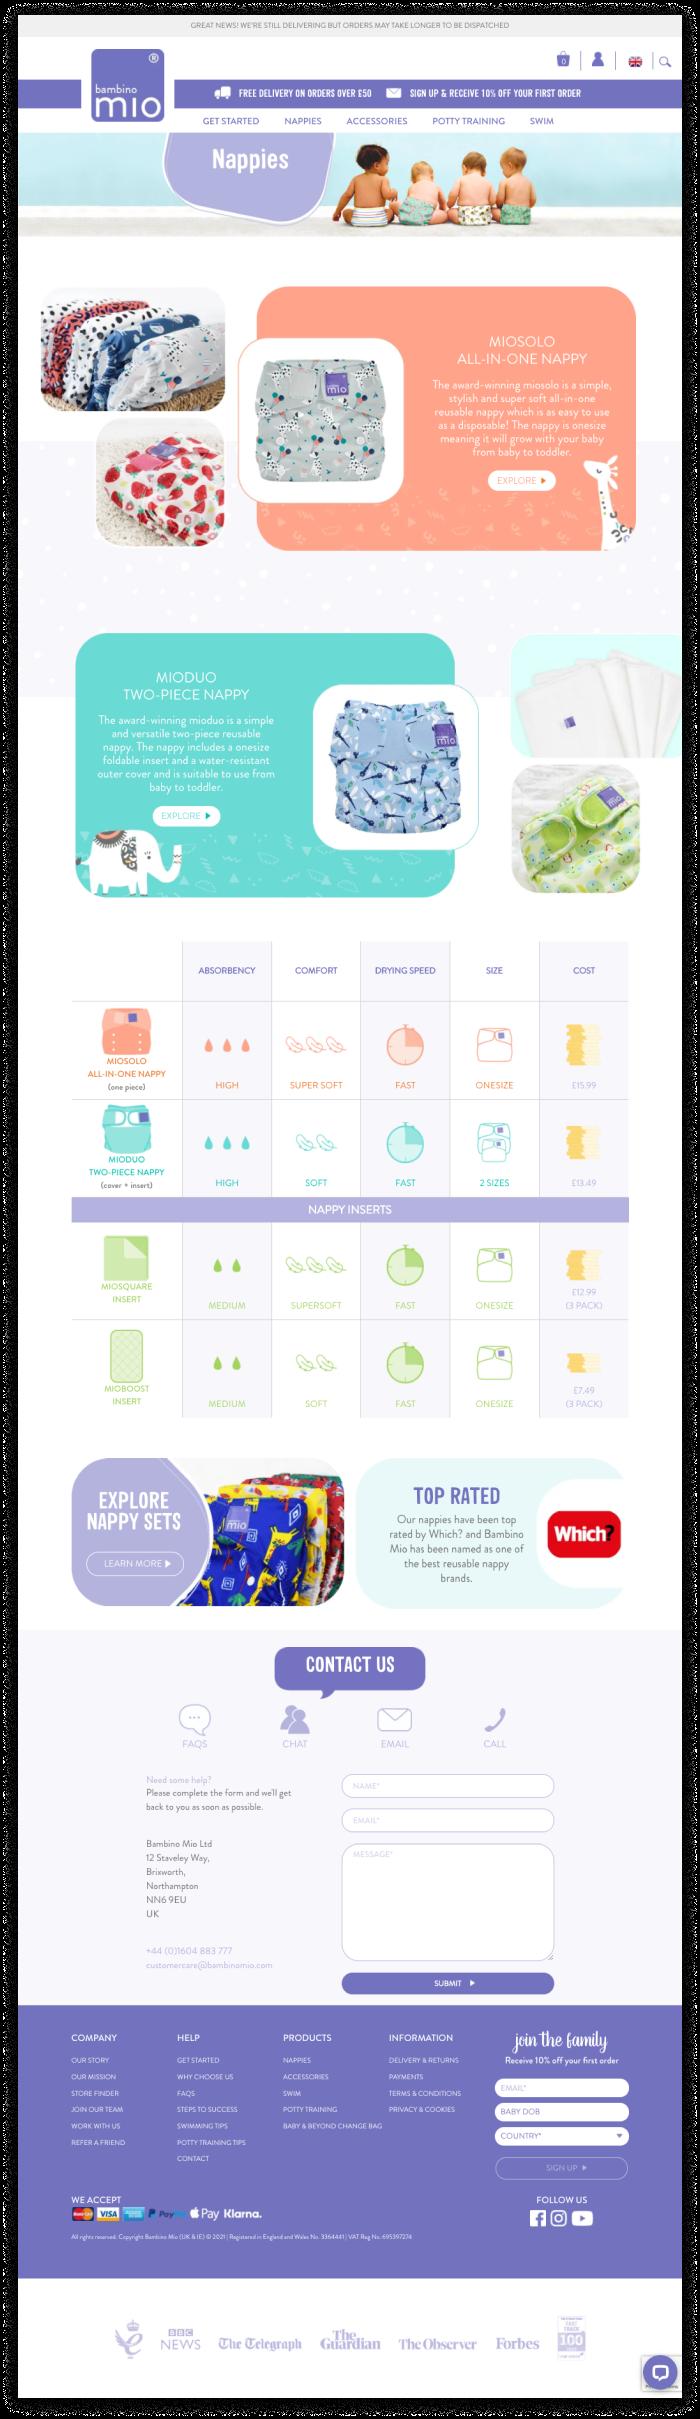 Bambino Mio Shopify Plus website